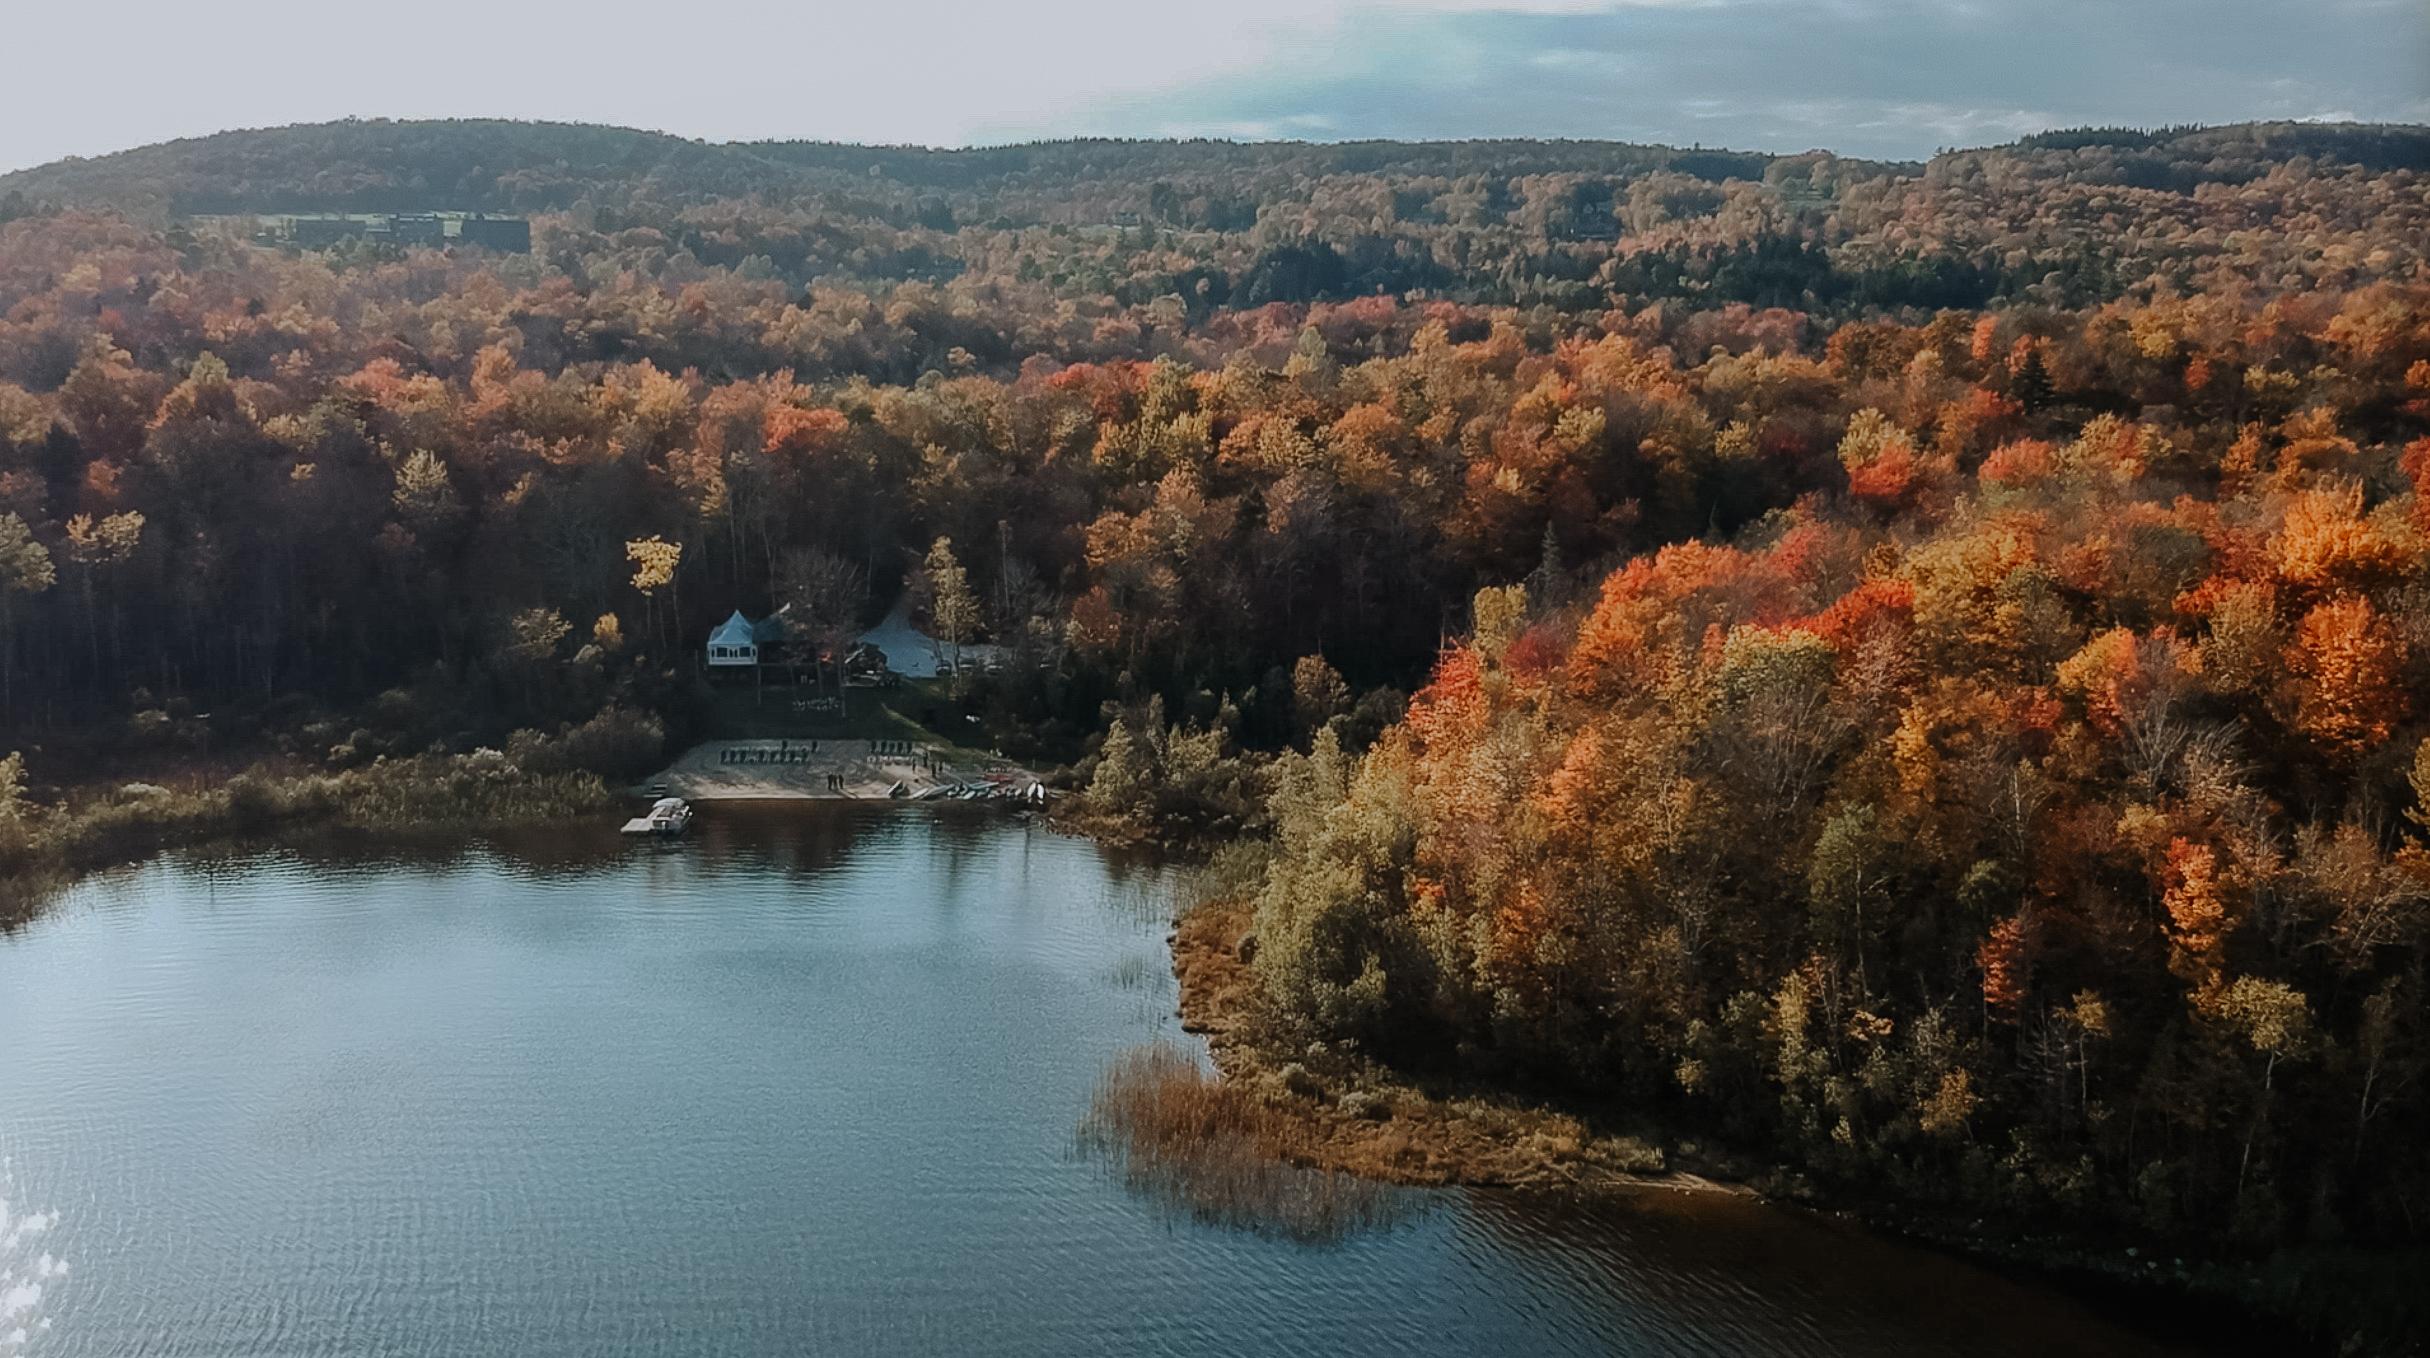 Ali + Jordan | Chittenden, Vermont | Mountain Top Inn, Chittenden